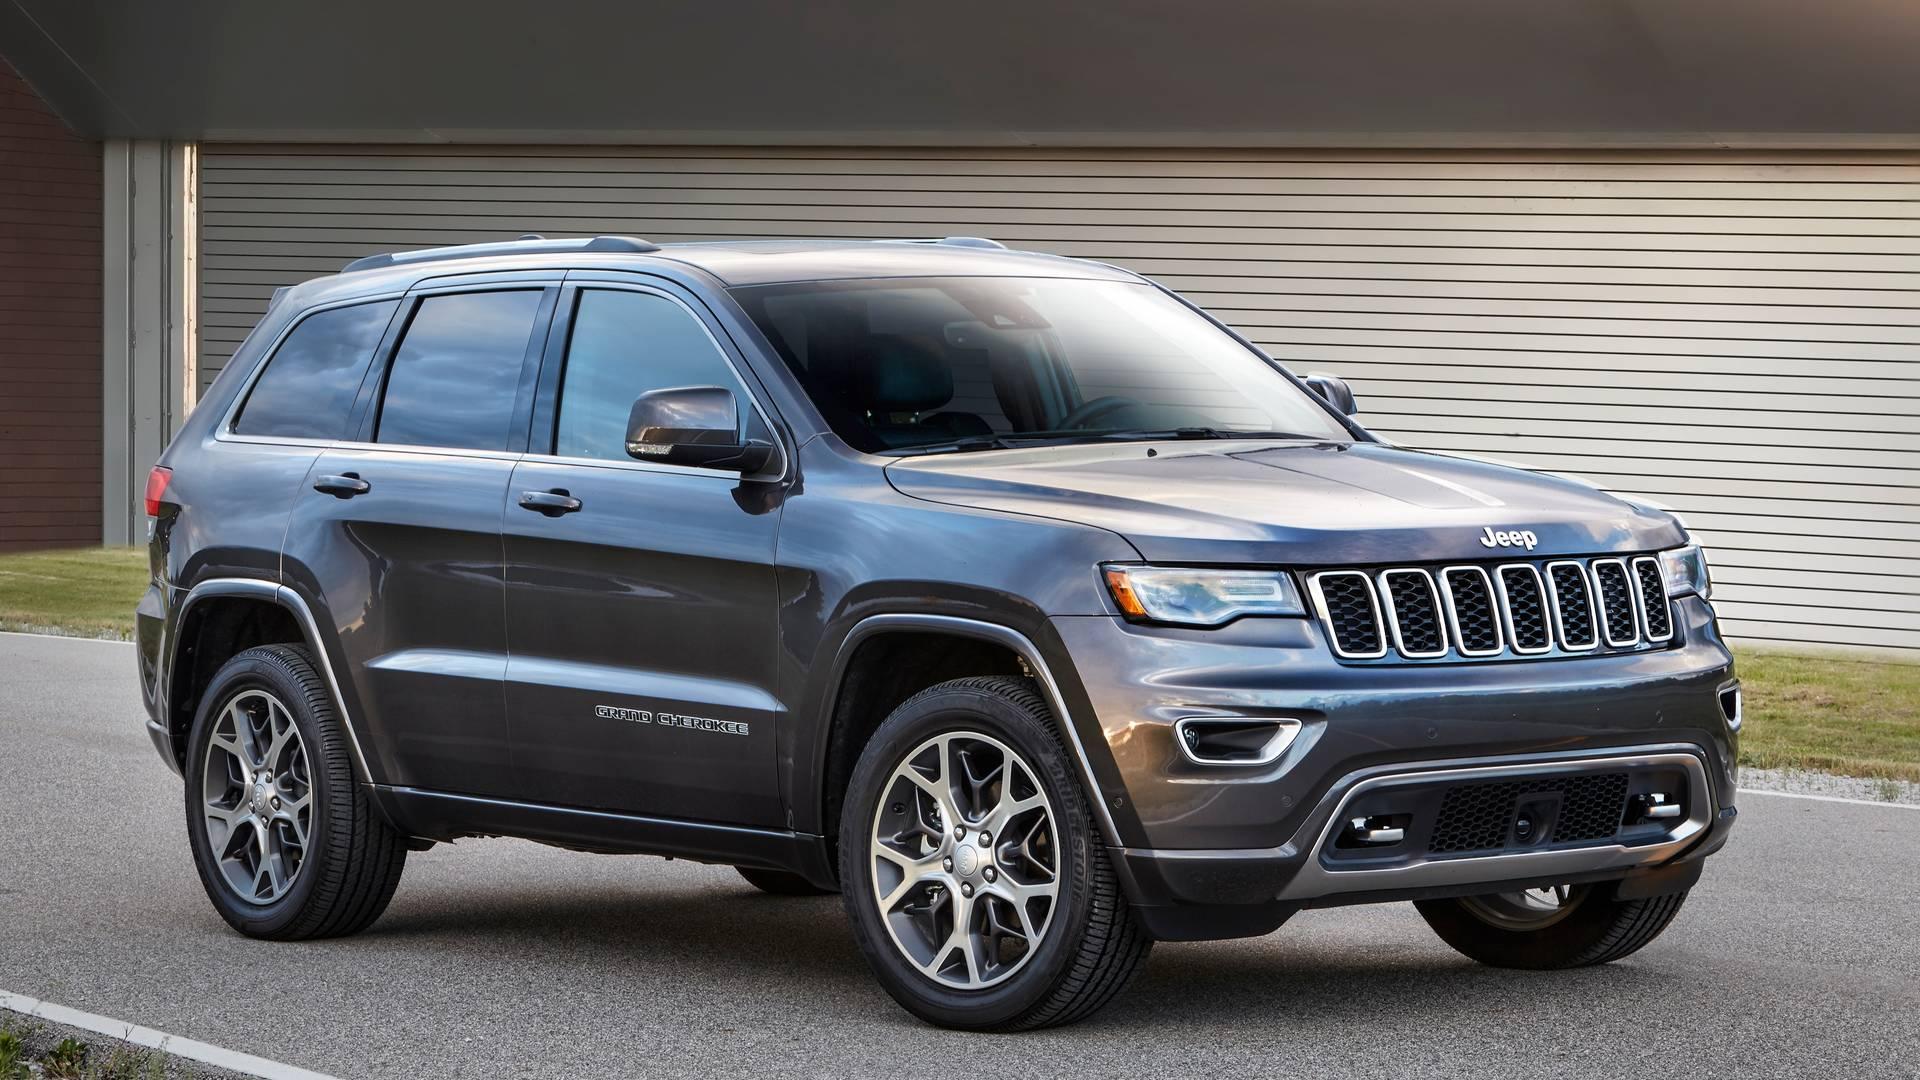 3 Row Jeep >> Closed Fca Engine Plant May Build Three Row Jeep Grand Cherokee